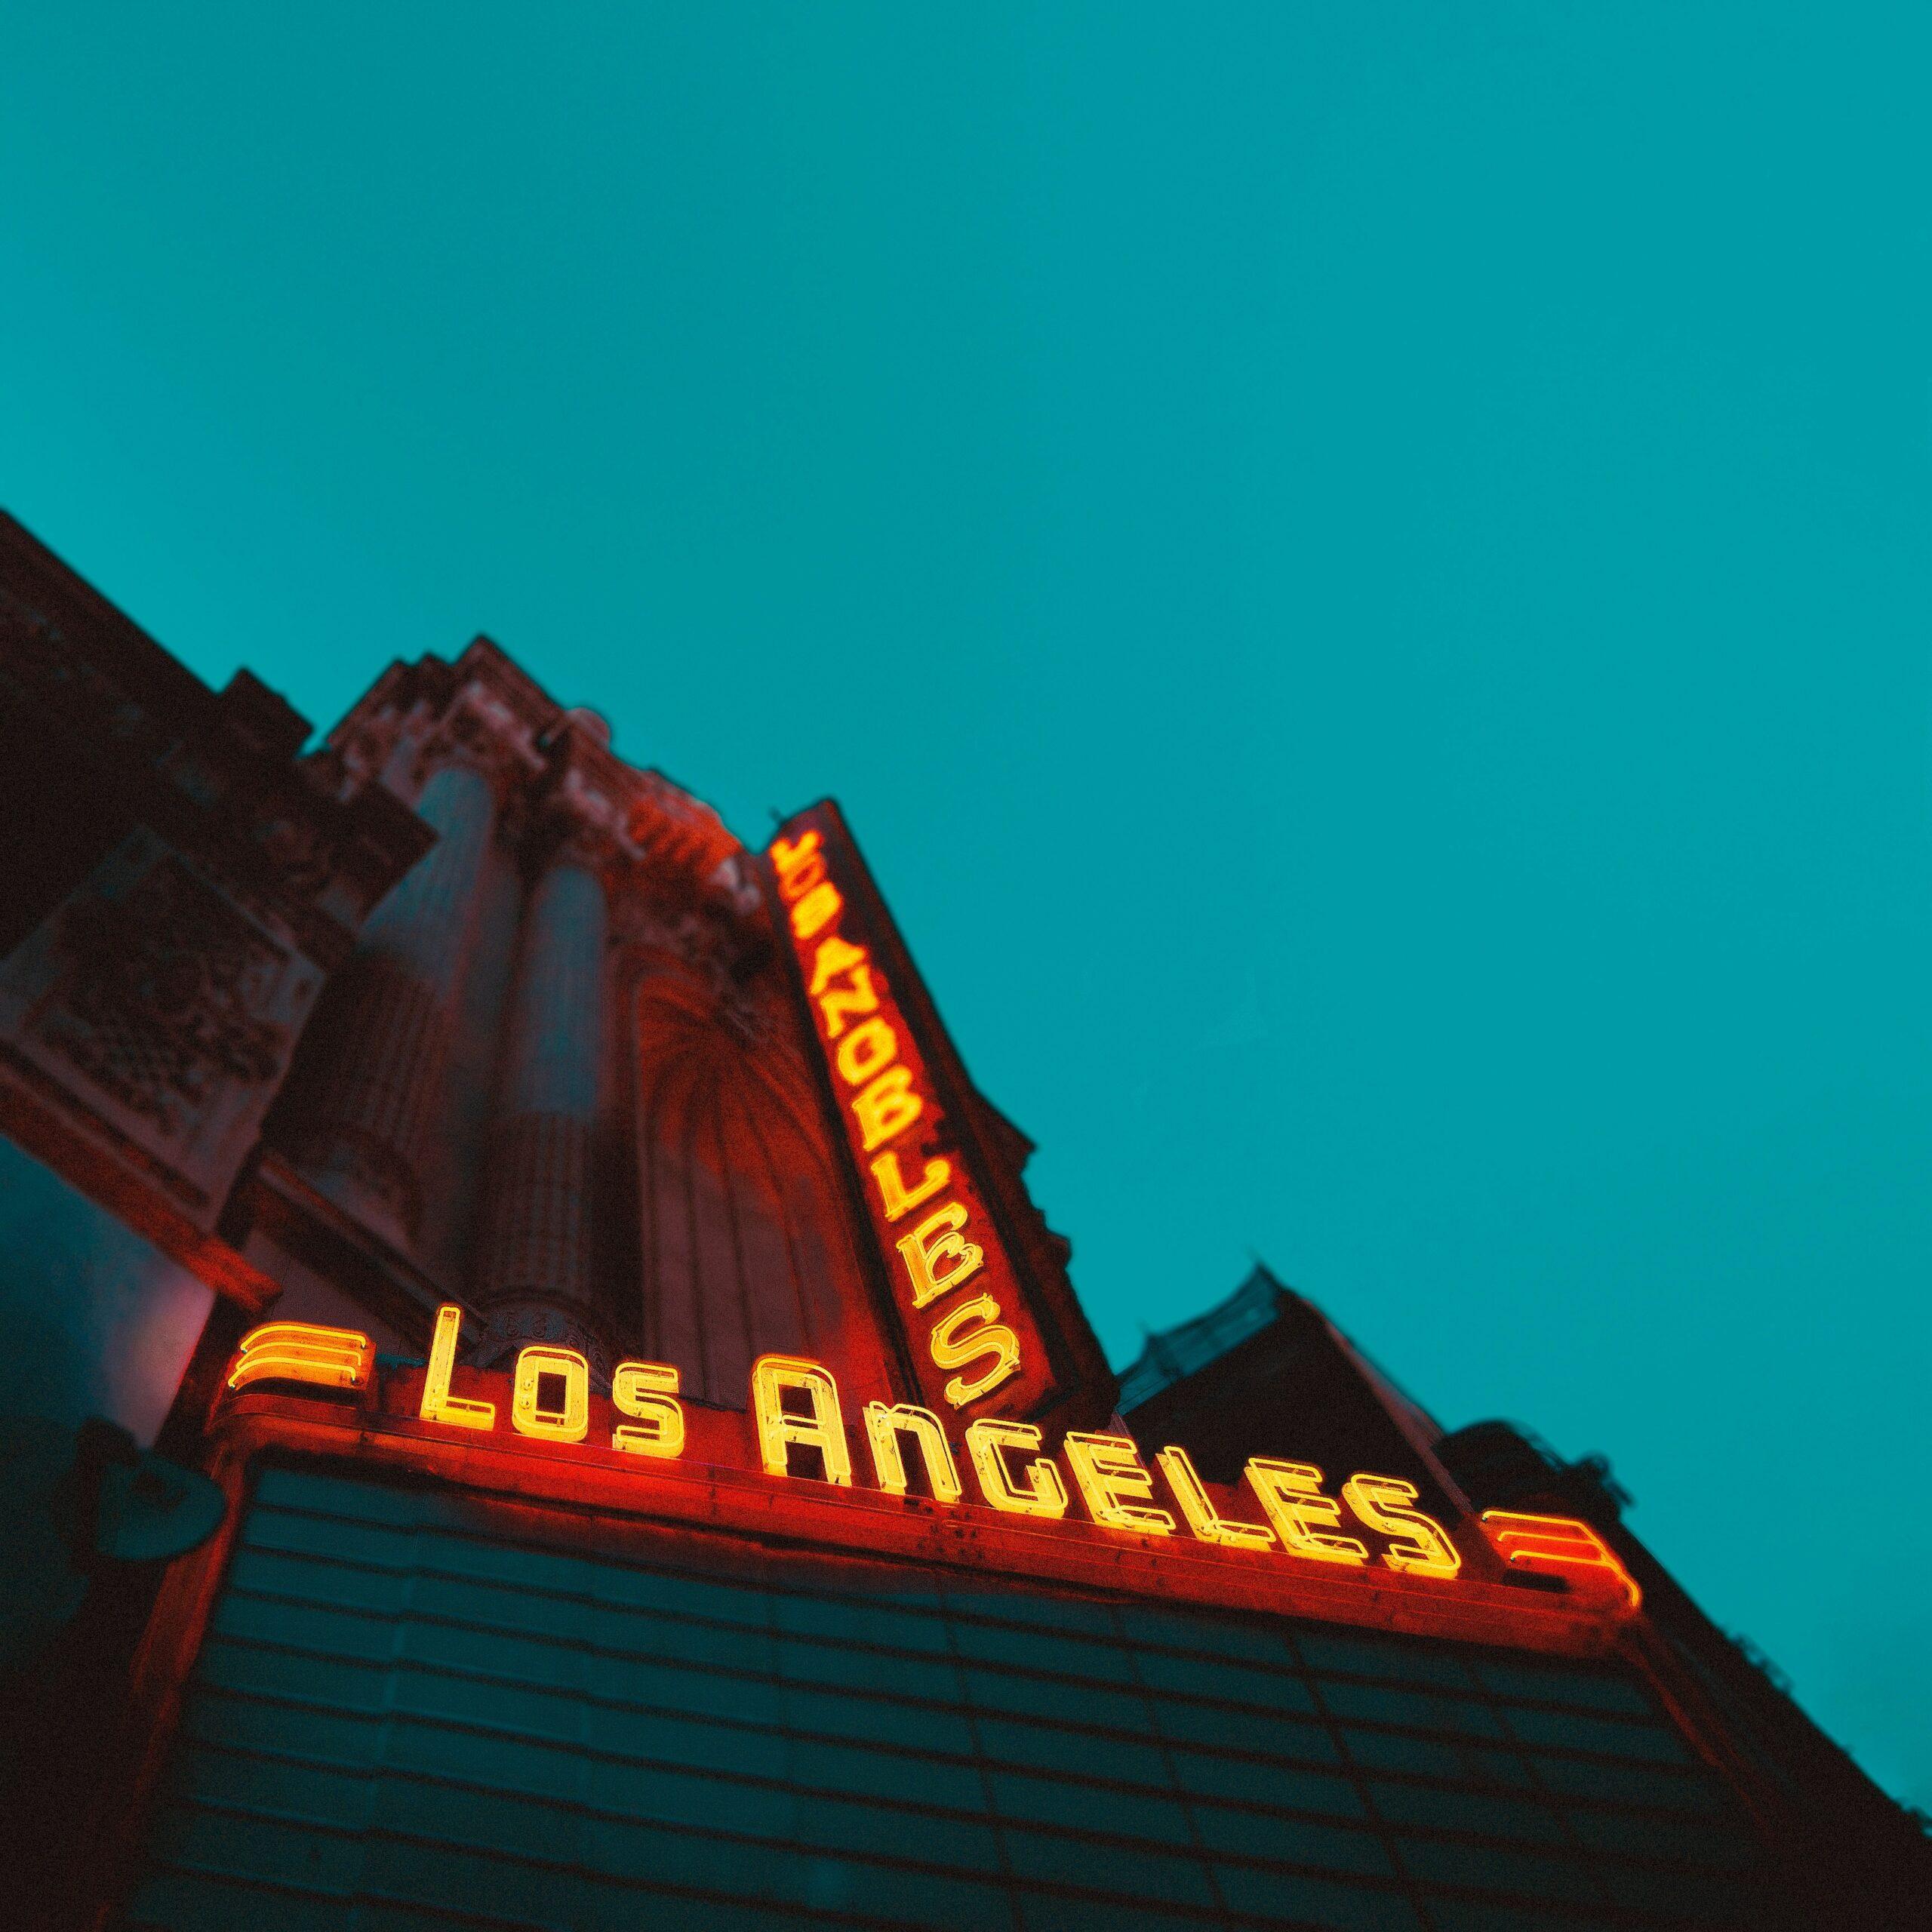 Coronavirus, Los Angeles, health